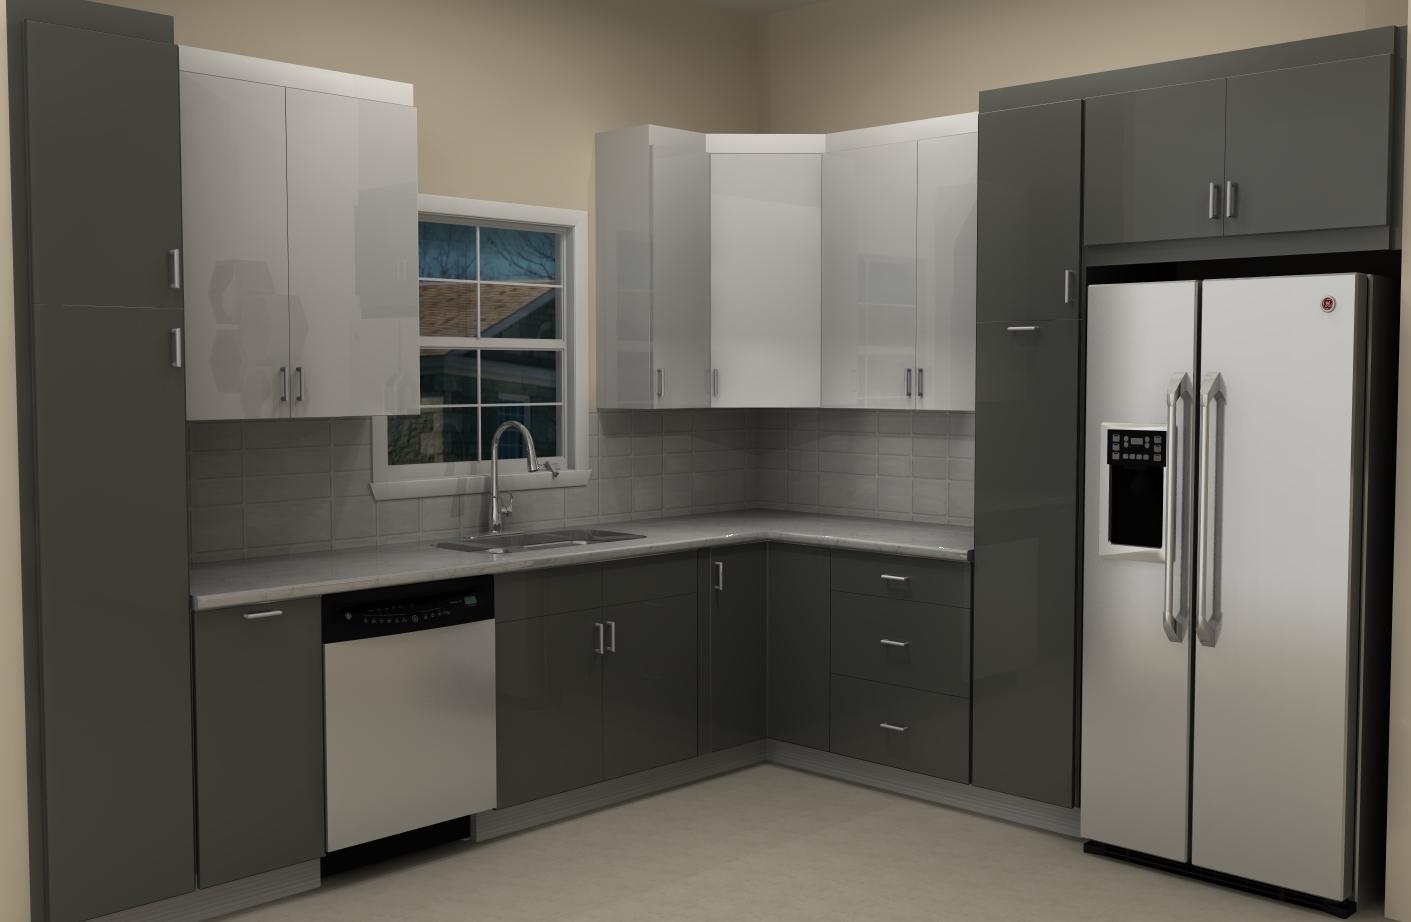 Decorating Top Refrigerator